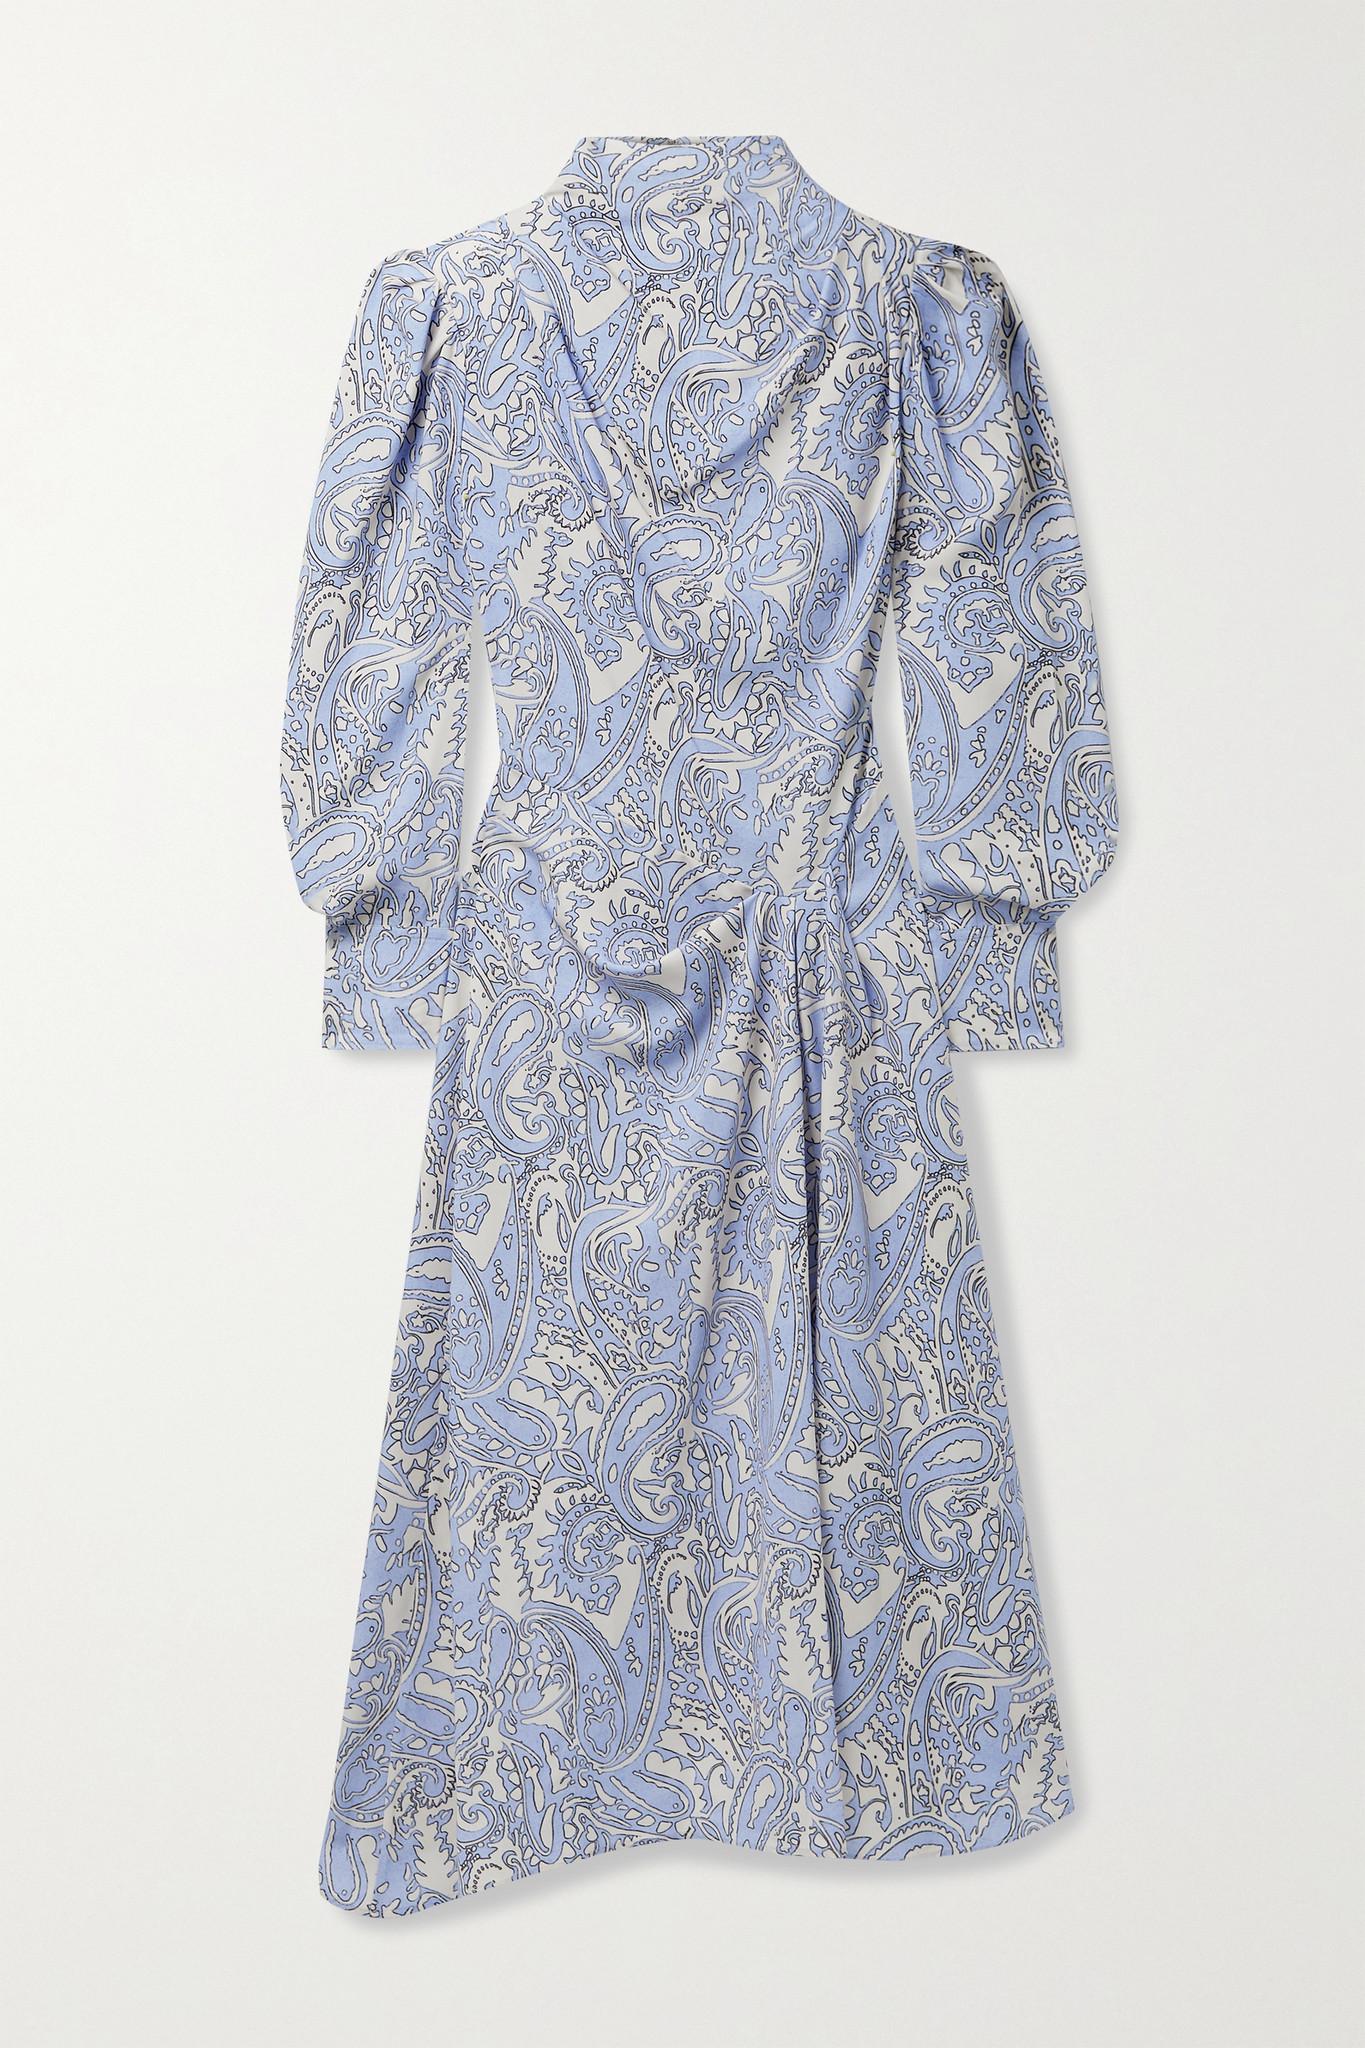 ISABEL MARANT - Berni 垂坠印花莱赛尔纤维斜纹布中长连衣裙 - 蓝色 - FR34